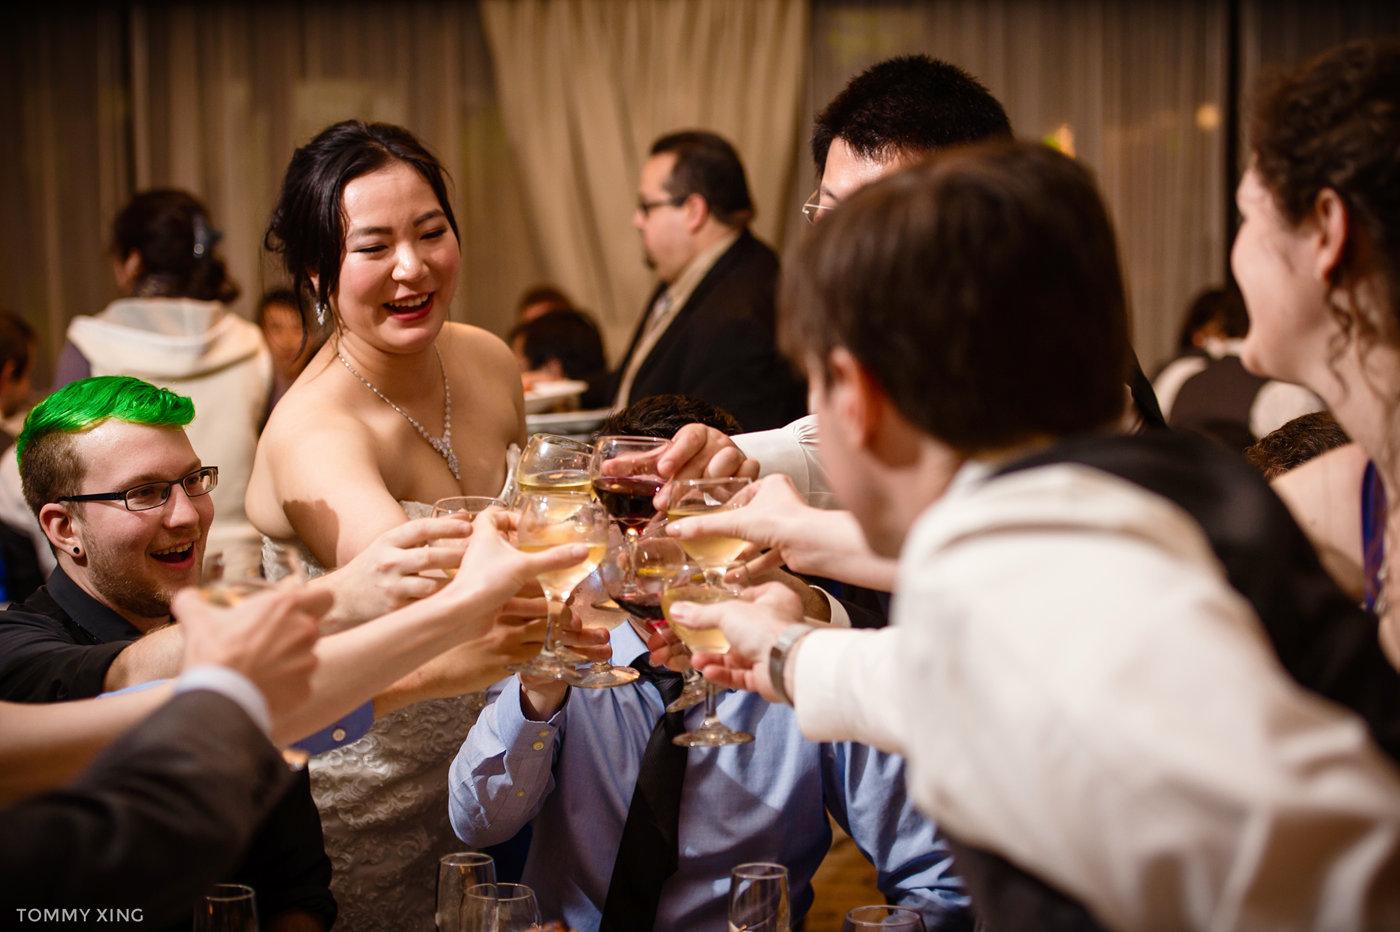 STANFORD MEMORIAL CHURCH WEDDING - Wenjie & Chengcheng - SAN FRANCISCO BAY AREA 斯坦福教堂婚礼跟拍 - 洛杉矶婚礼婚纱照摄影师 Tommy Xing Photography180.jpg